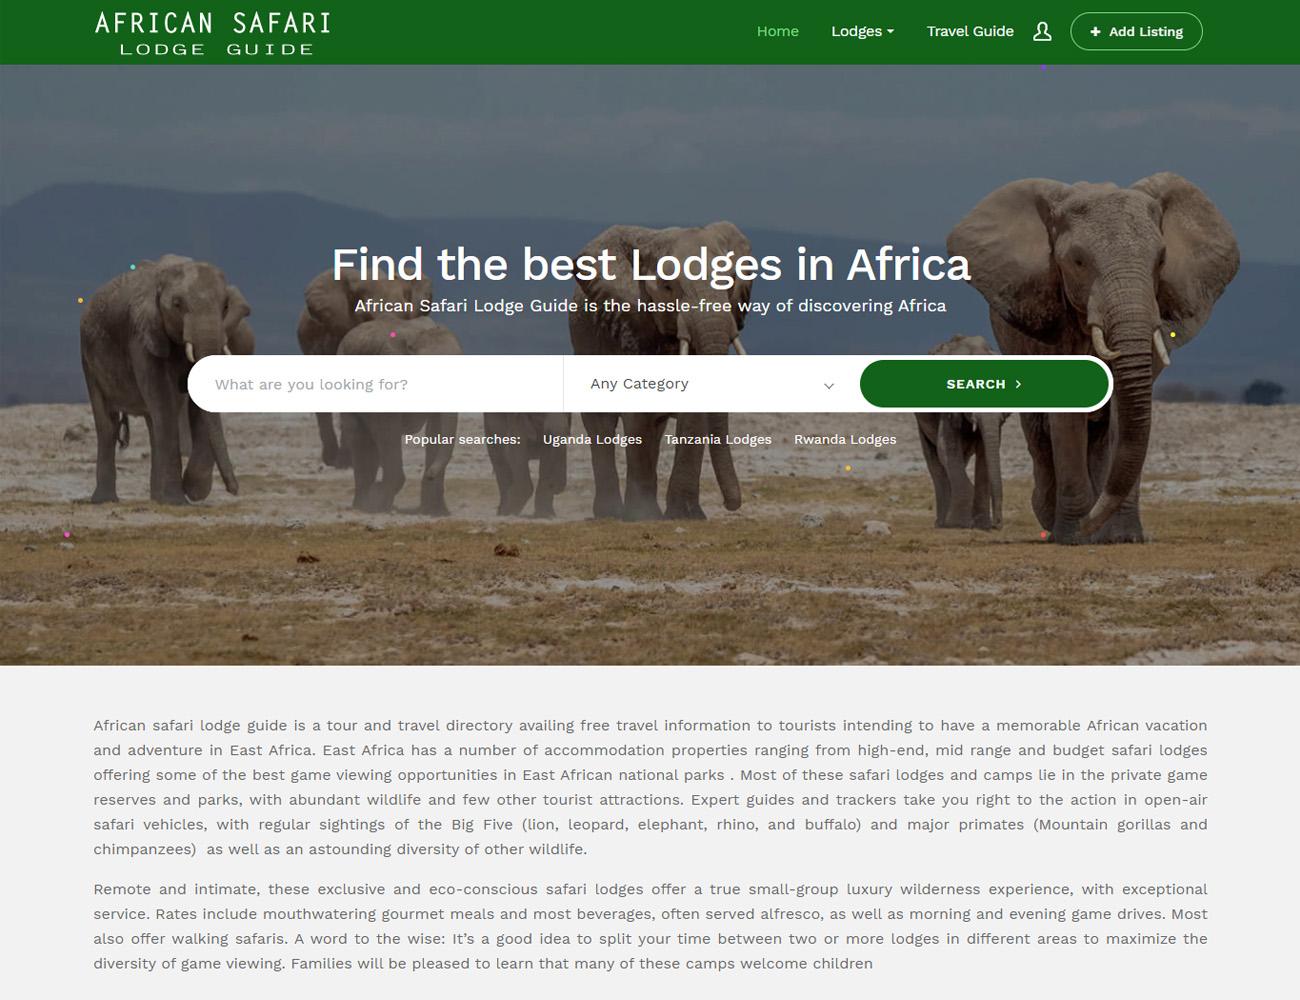 African safari lodge guide website designed by HostGiant